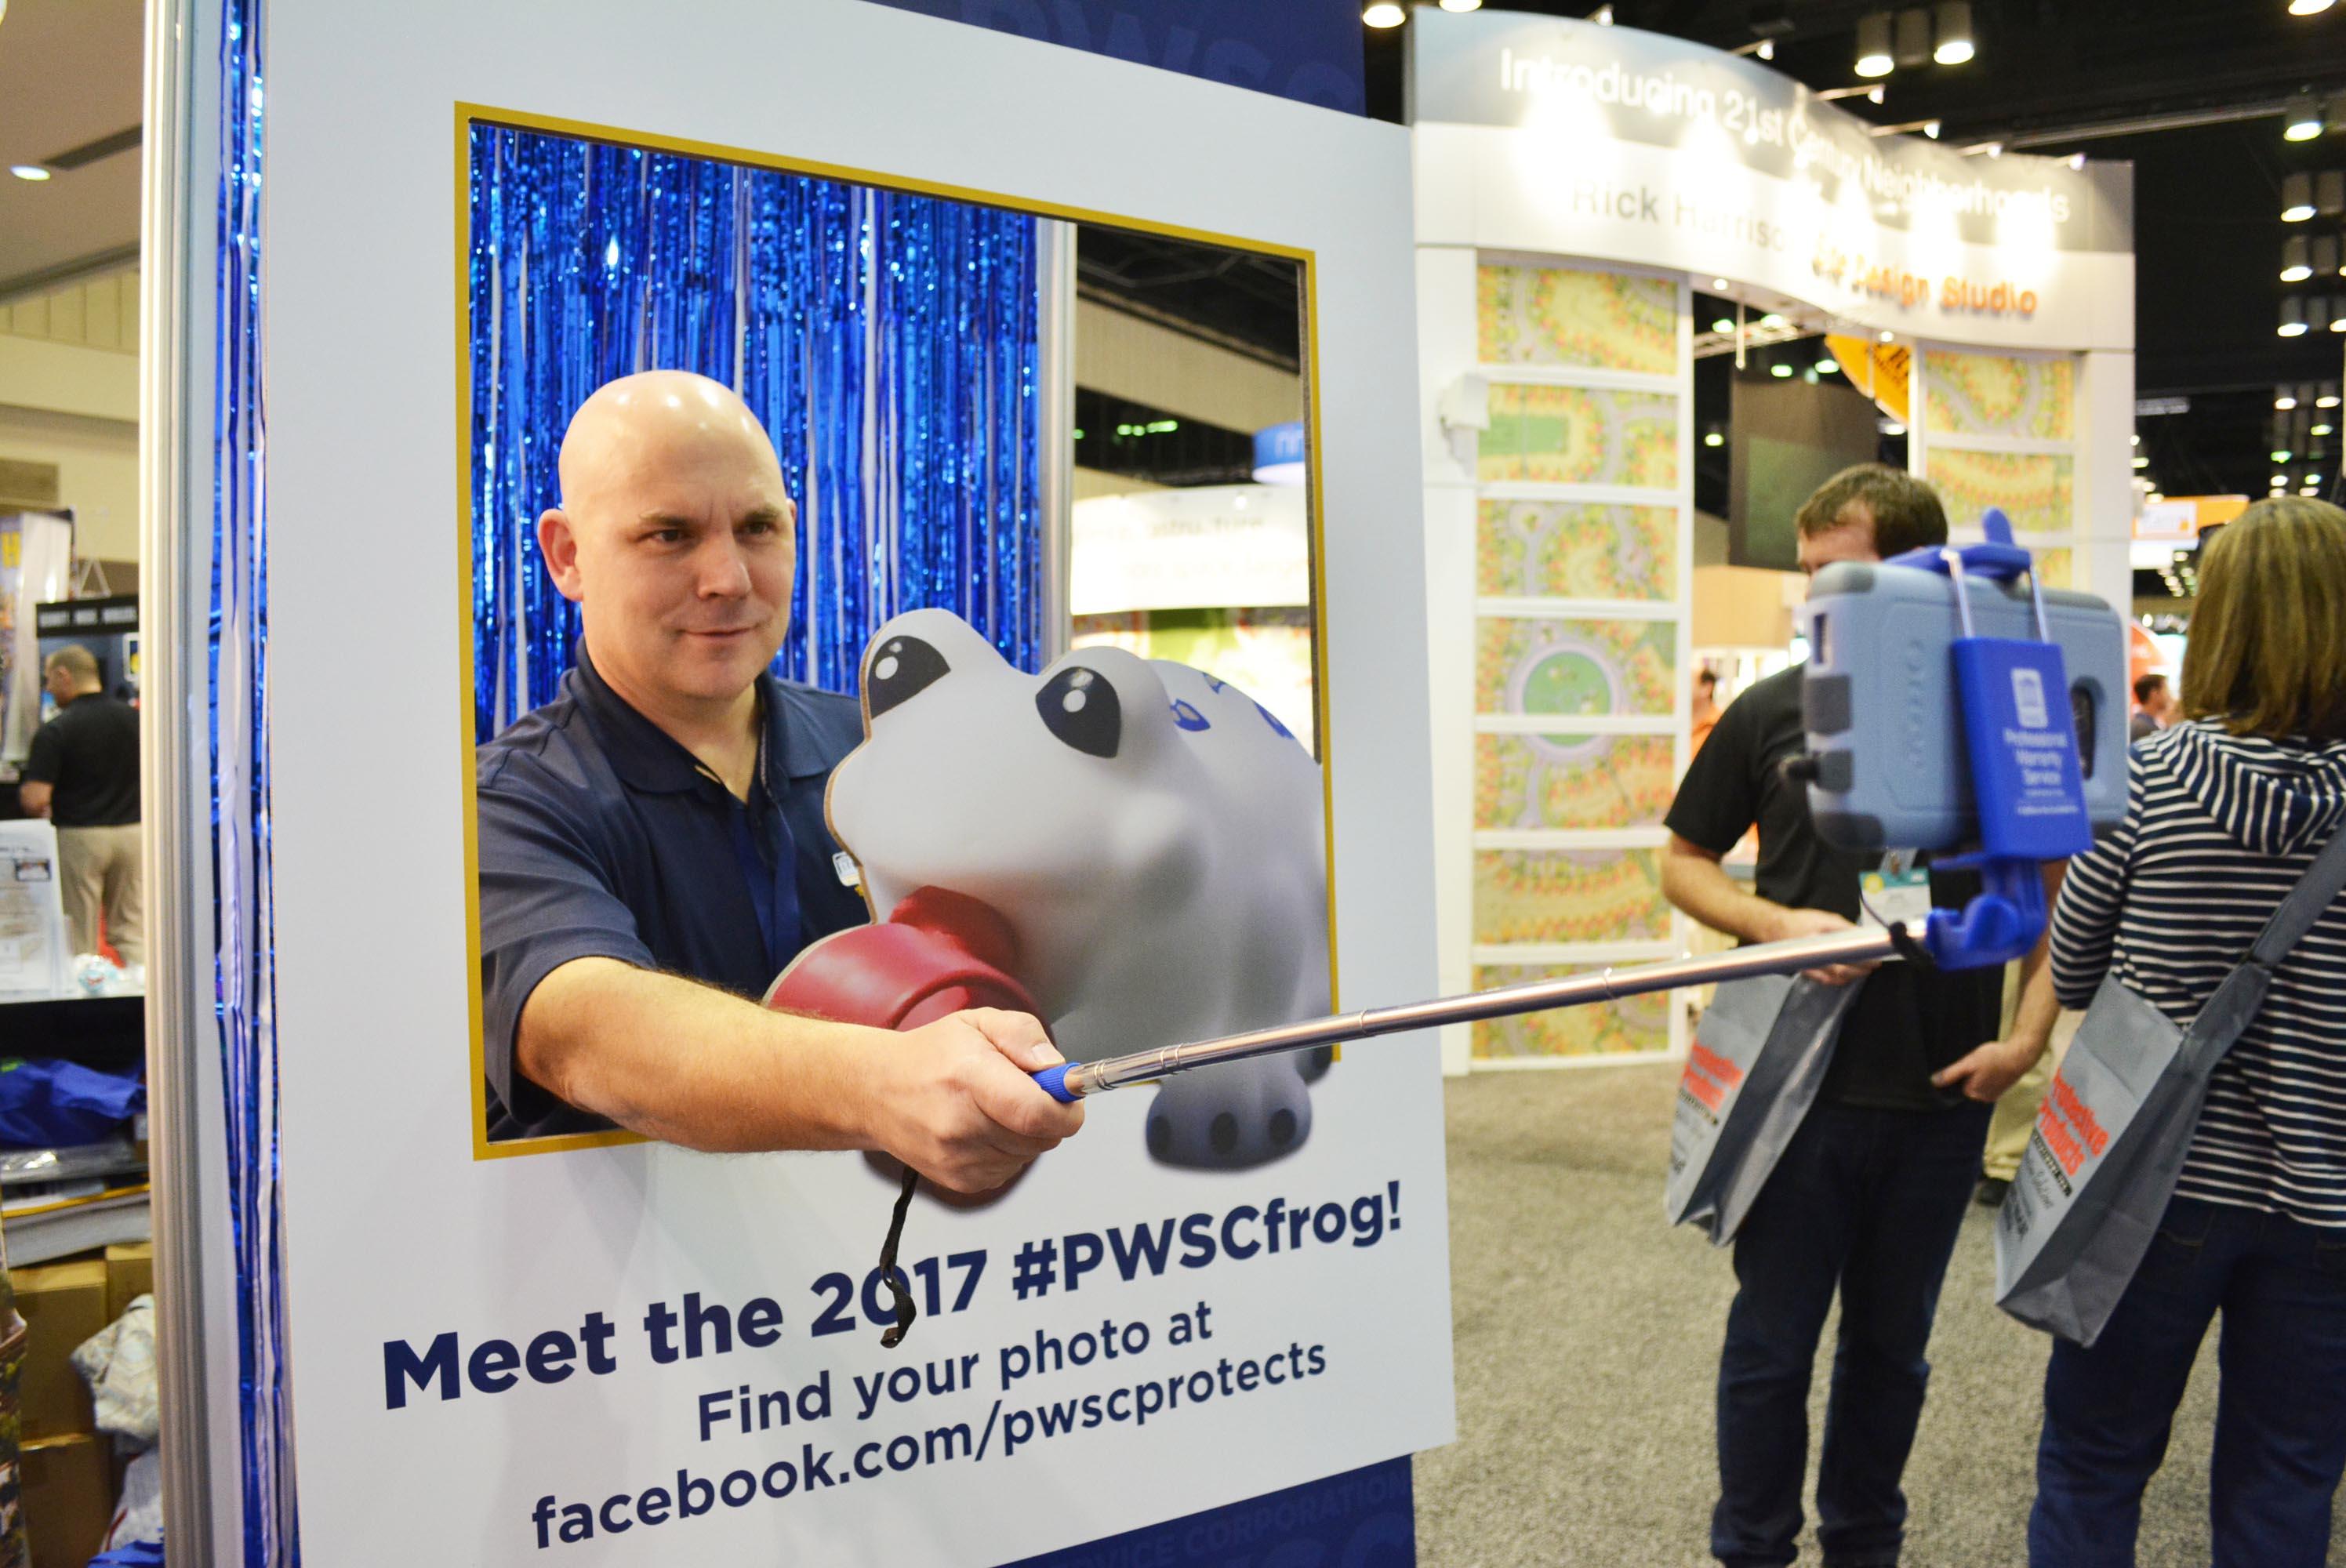 Roger Langford PWSC Selfie